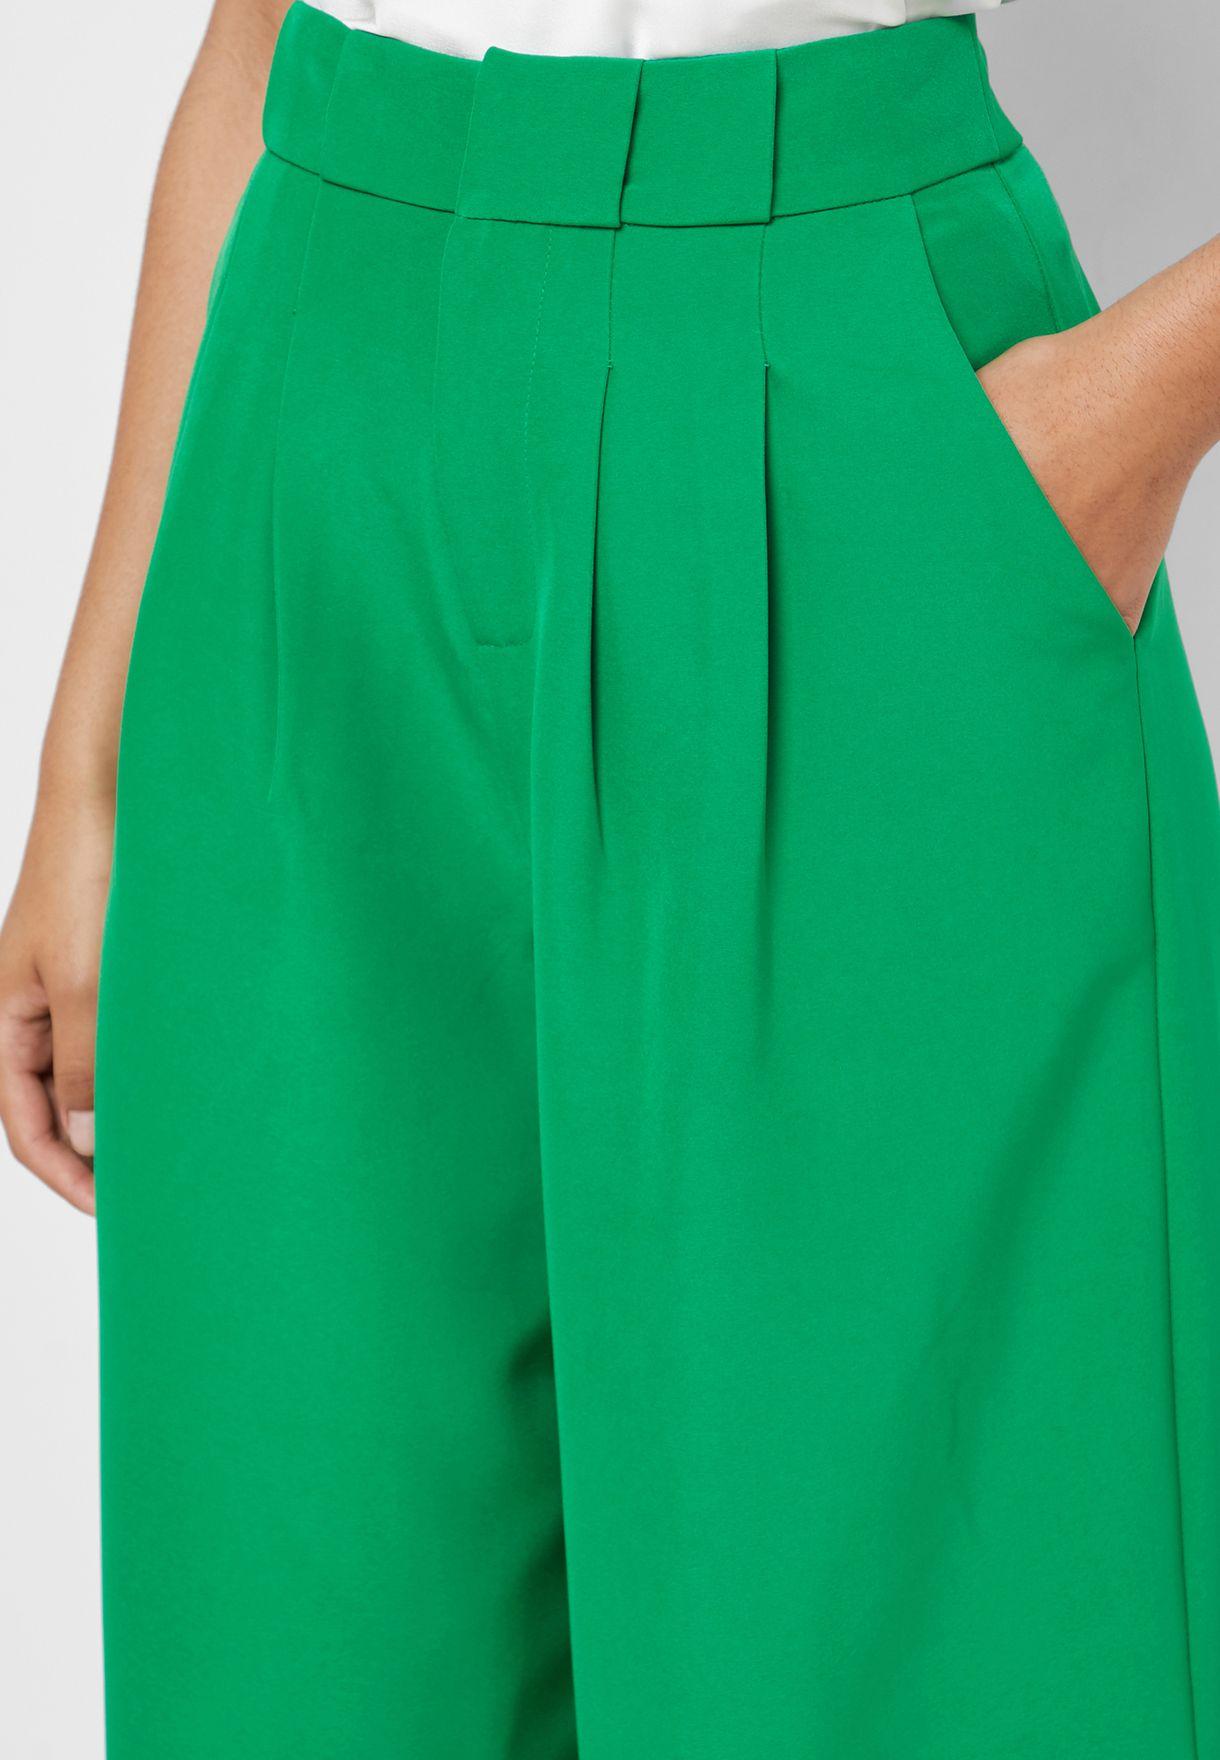 Buy English Factory Green High Waist Wide Leg Pants For Women, Uae 18832at14cap